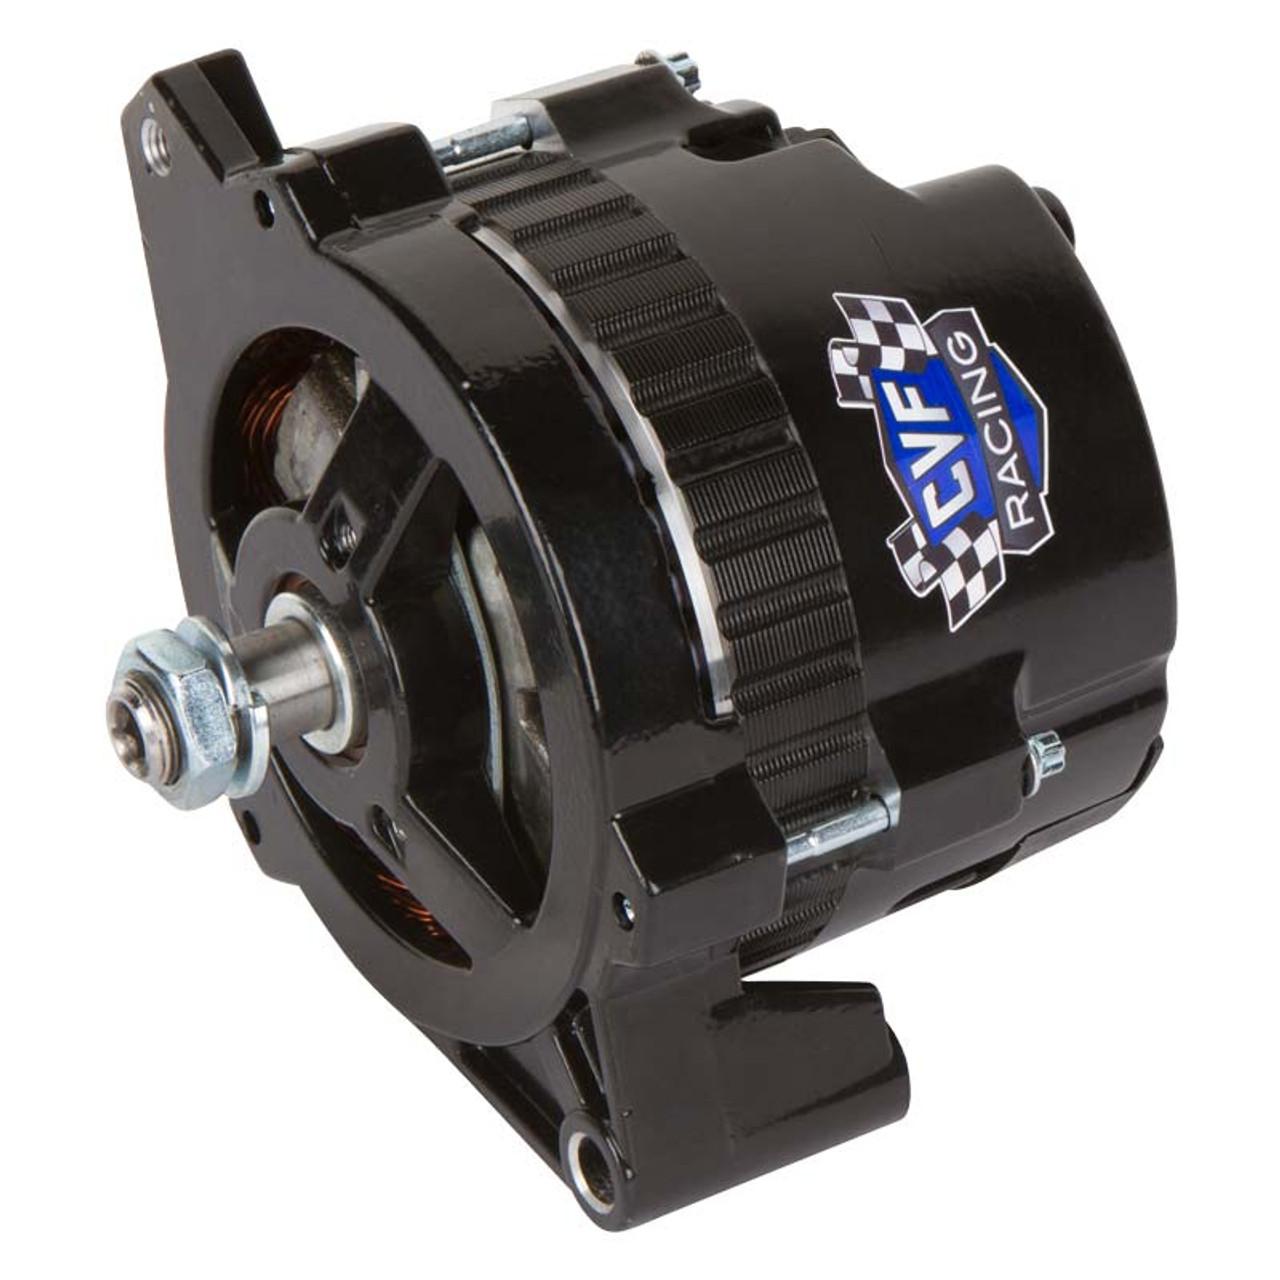 GM 1 Wire Alternator, 140 Amp, ChromeCVF Racing